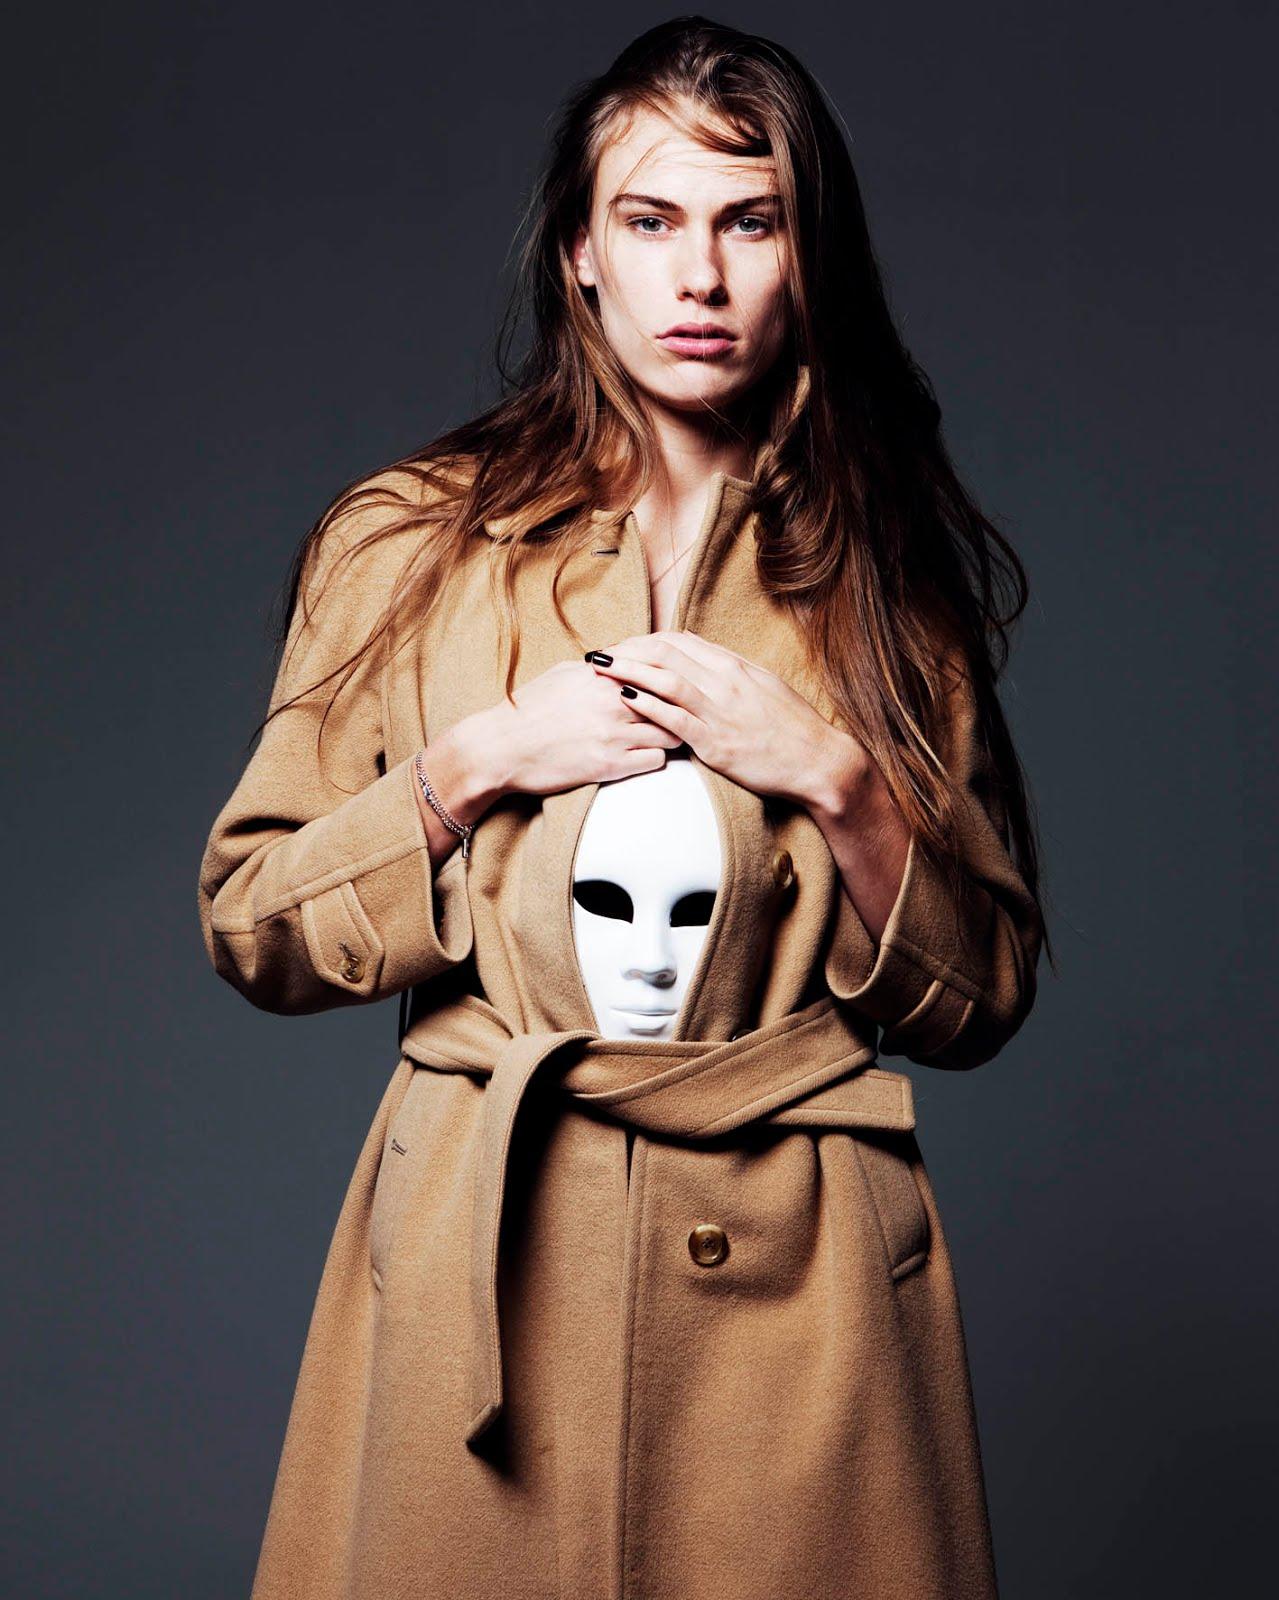 Tamara Derkach nude photos 2019